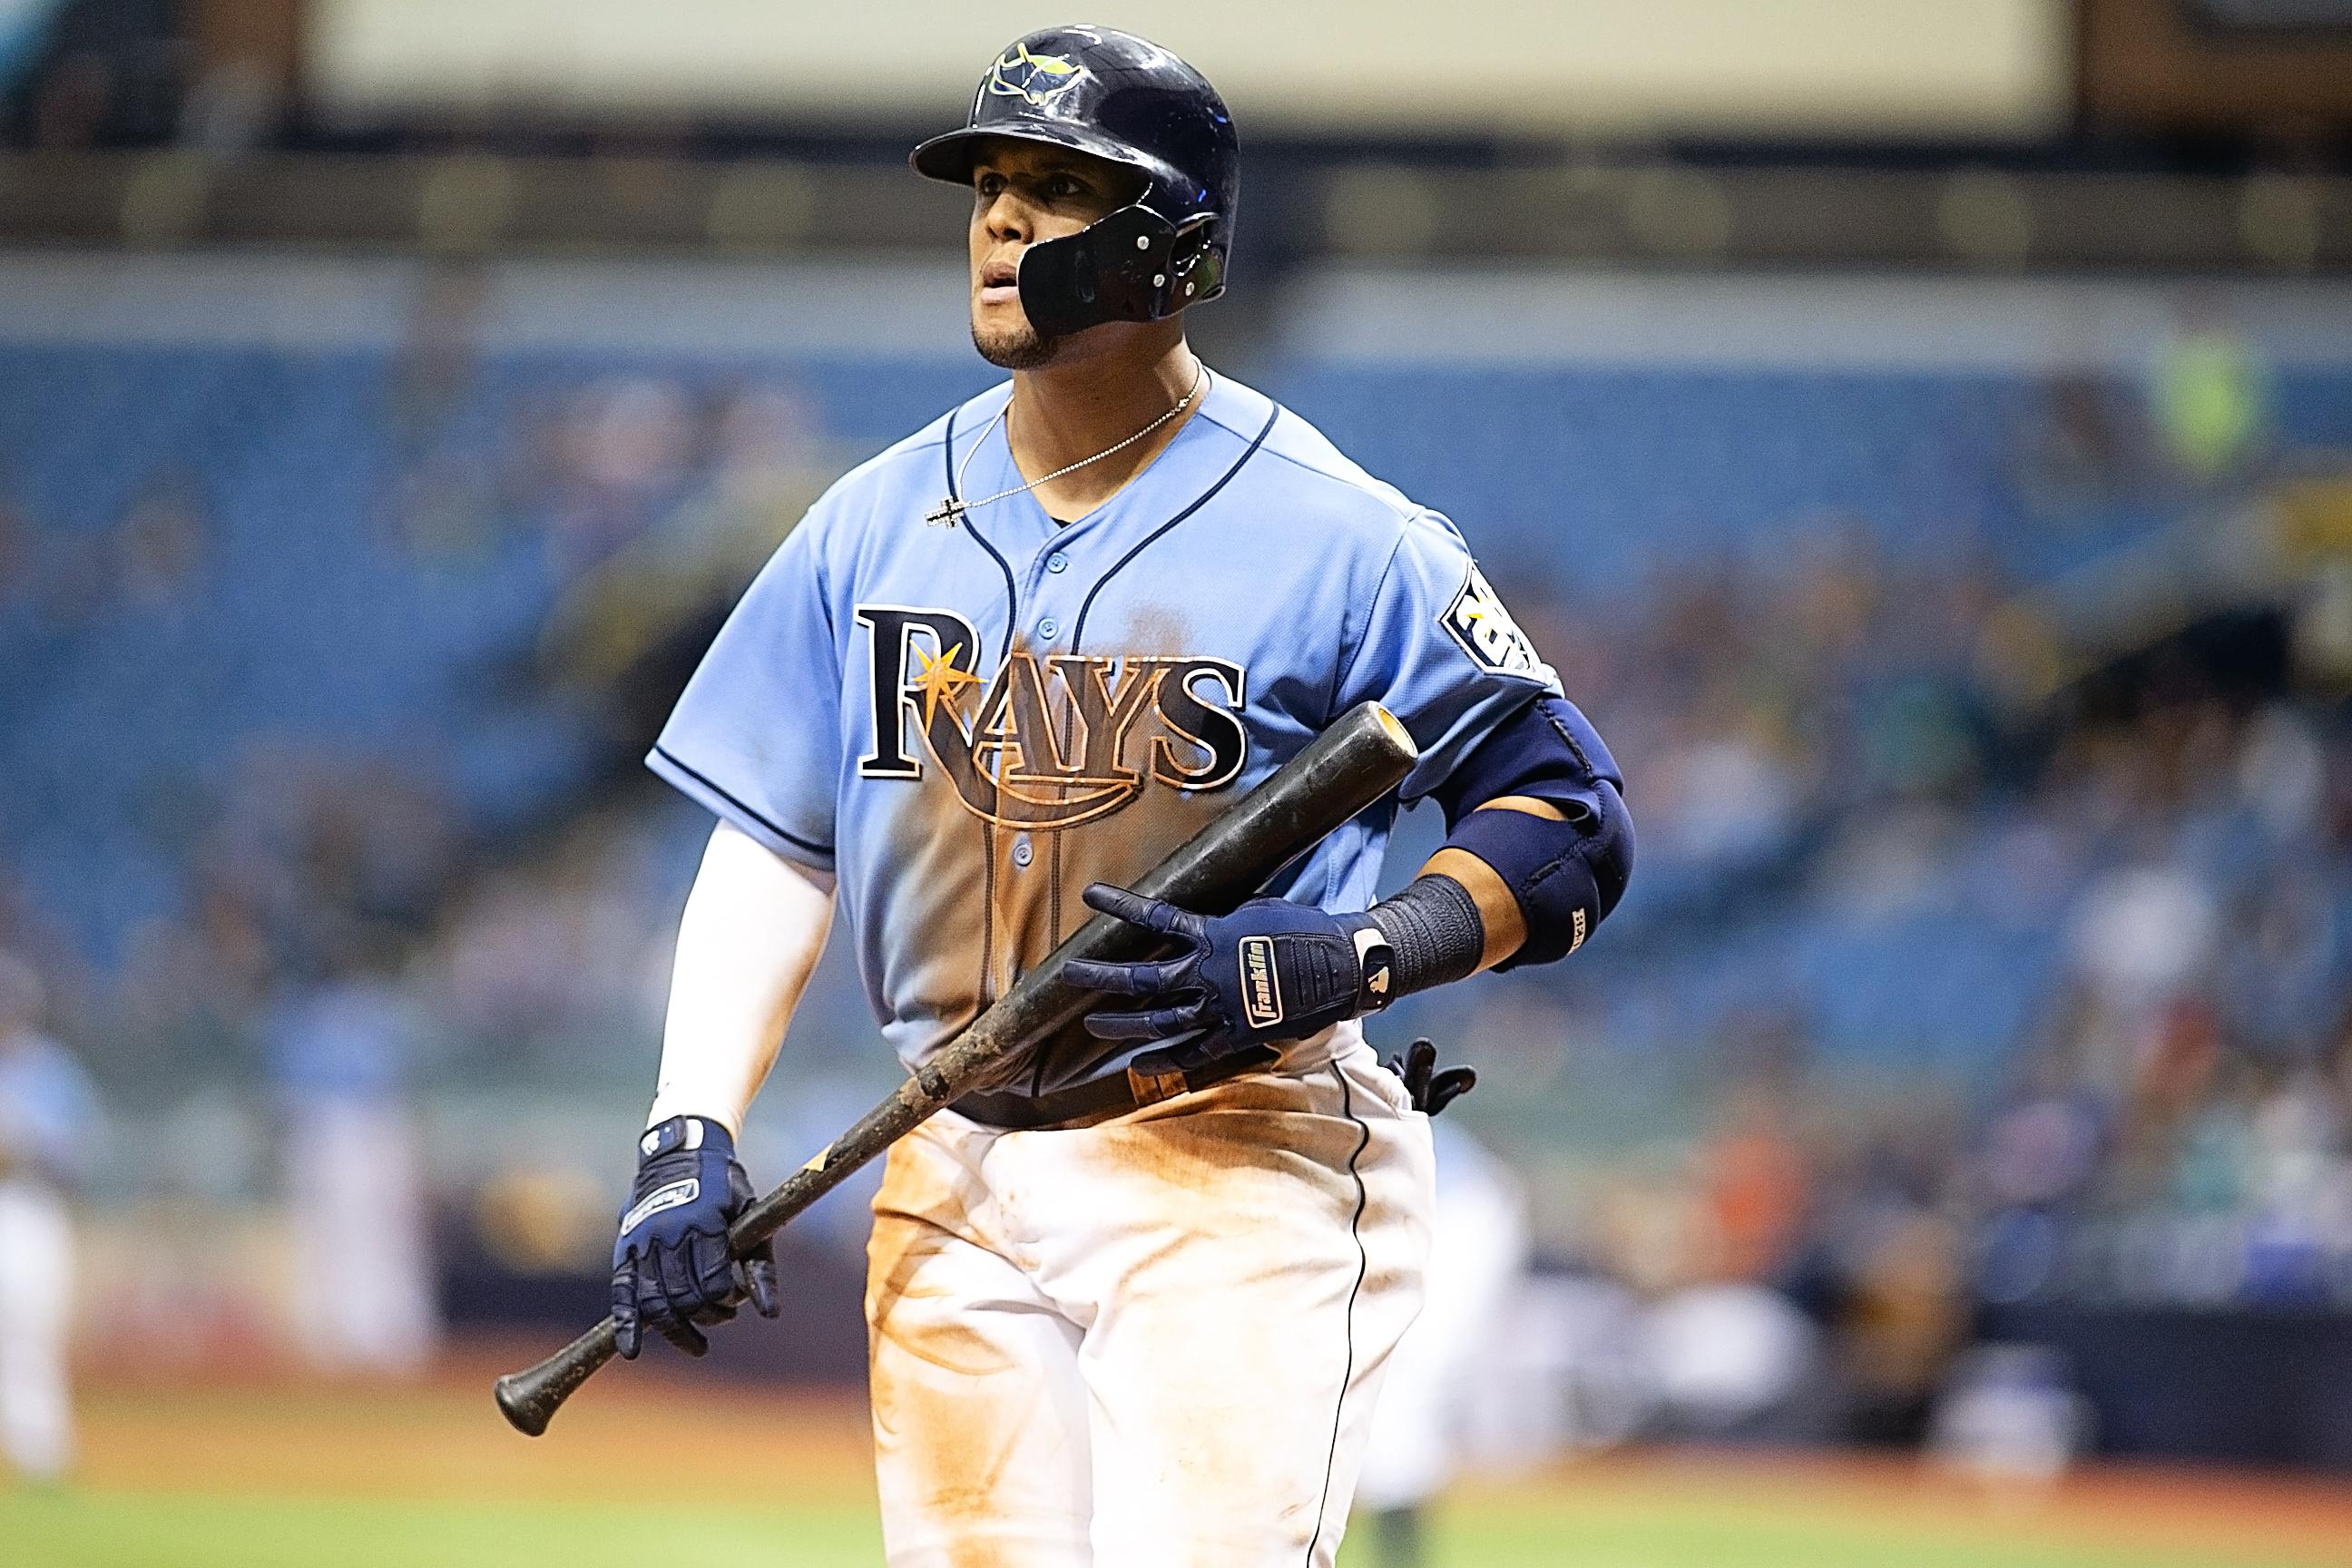 Gomez had two hits for Tampa Bay./CARMEN MANDATO